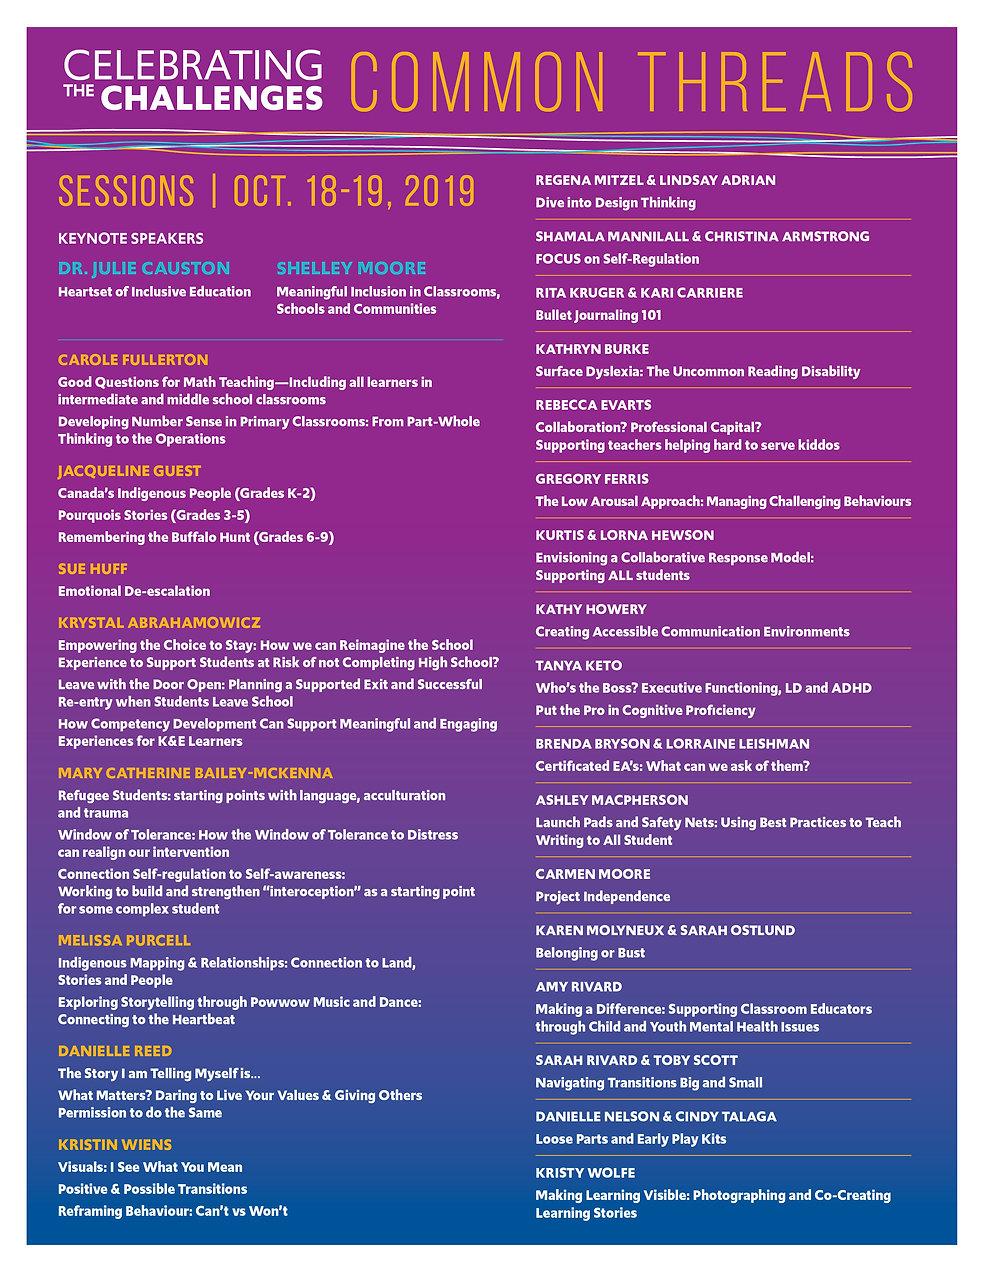 Session List 2019.jpg